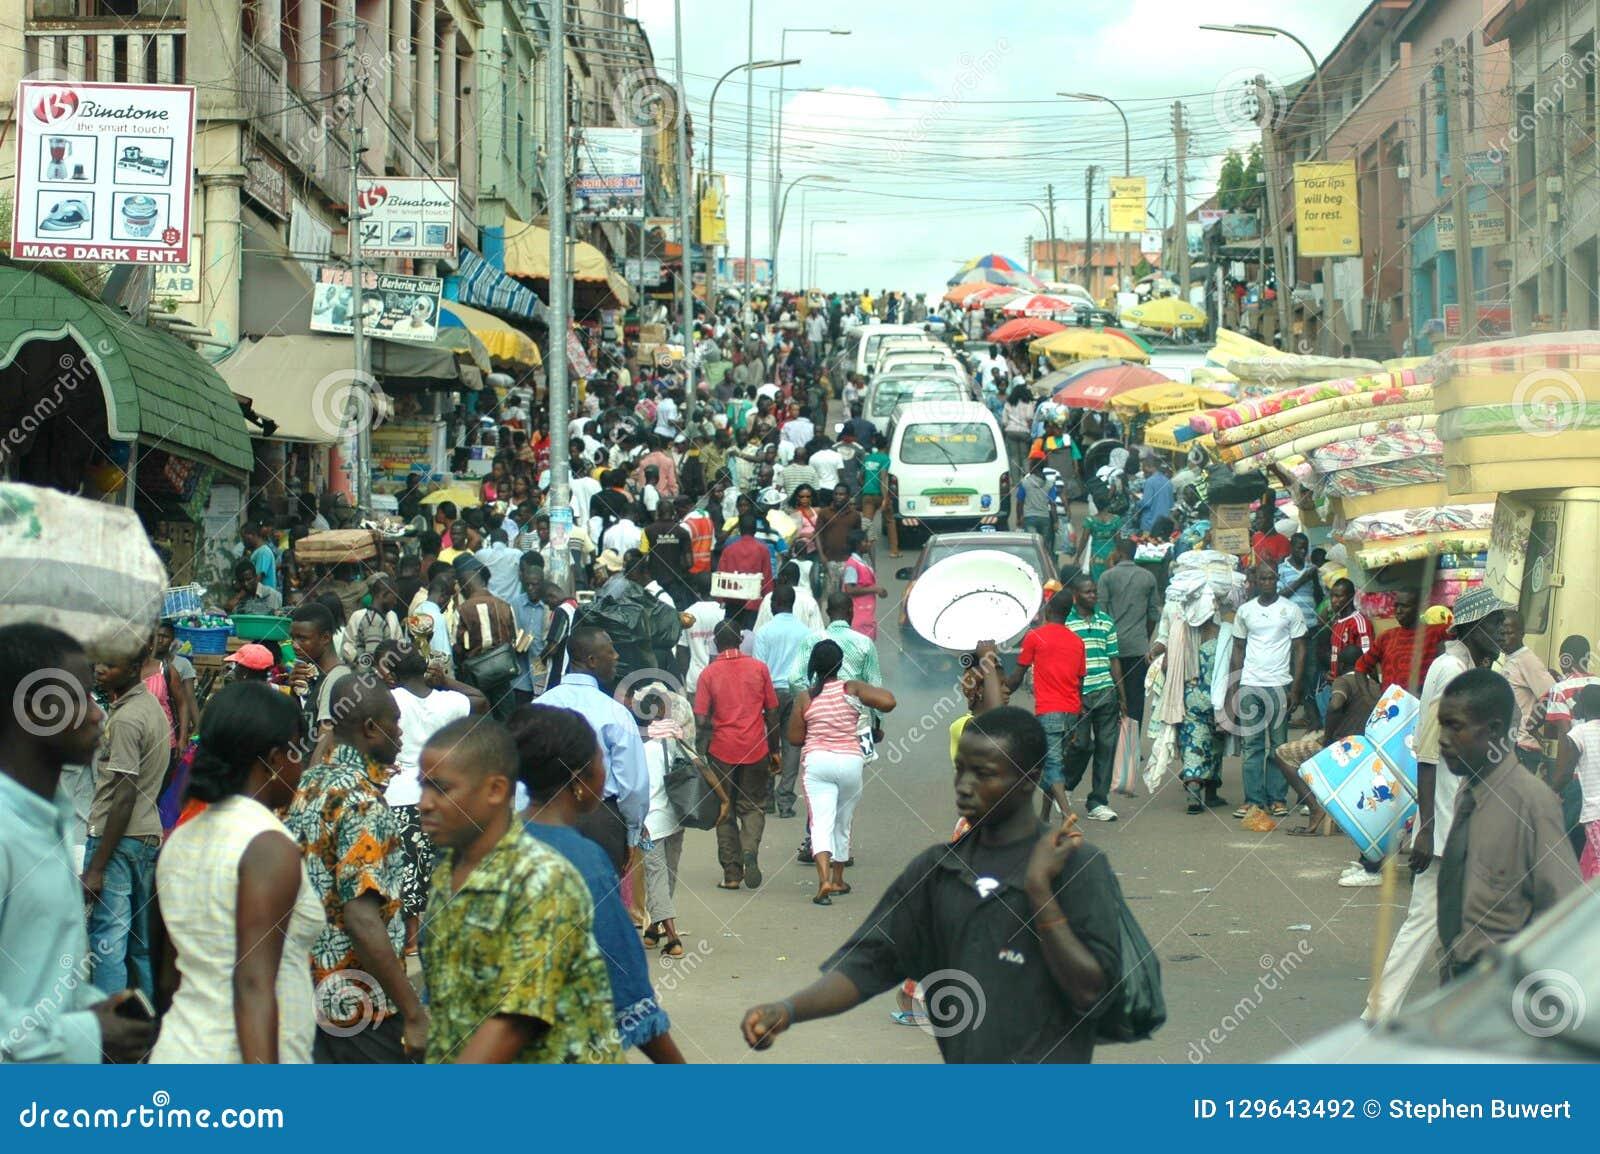 Una calle muy transitada en Kumasi, Ghana